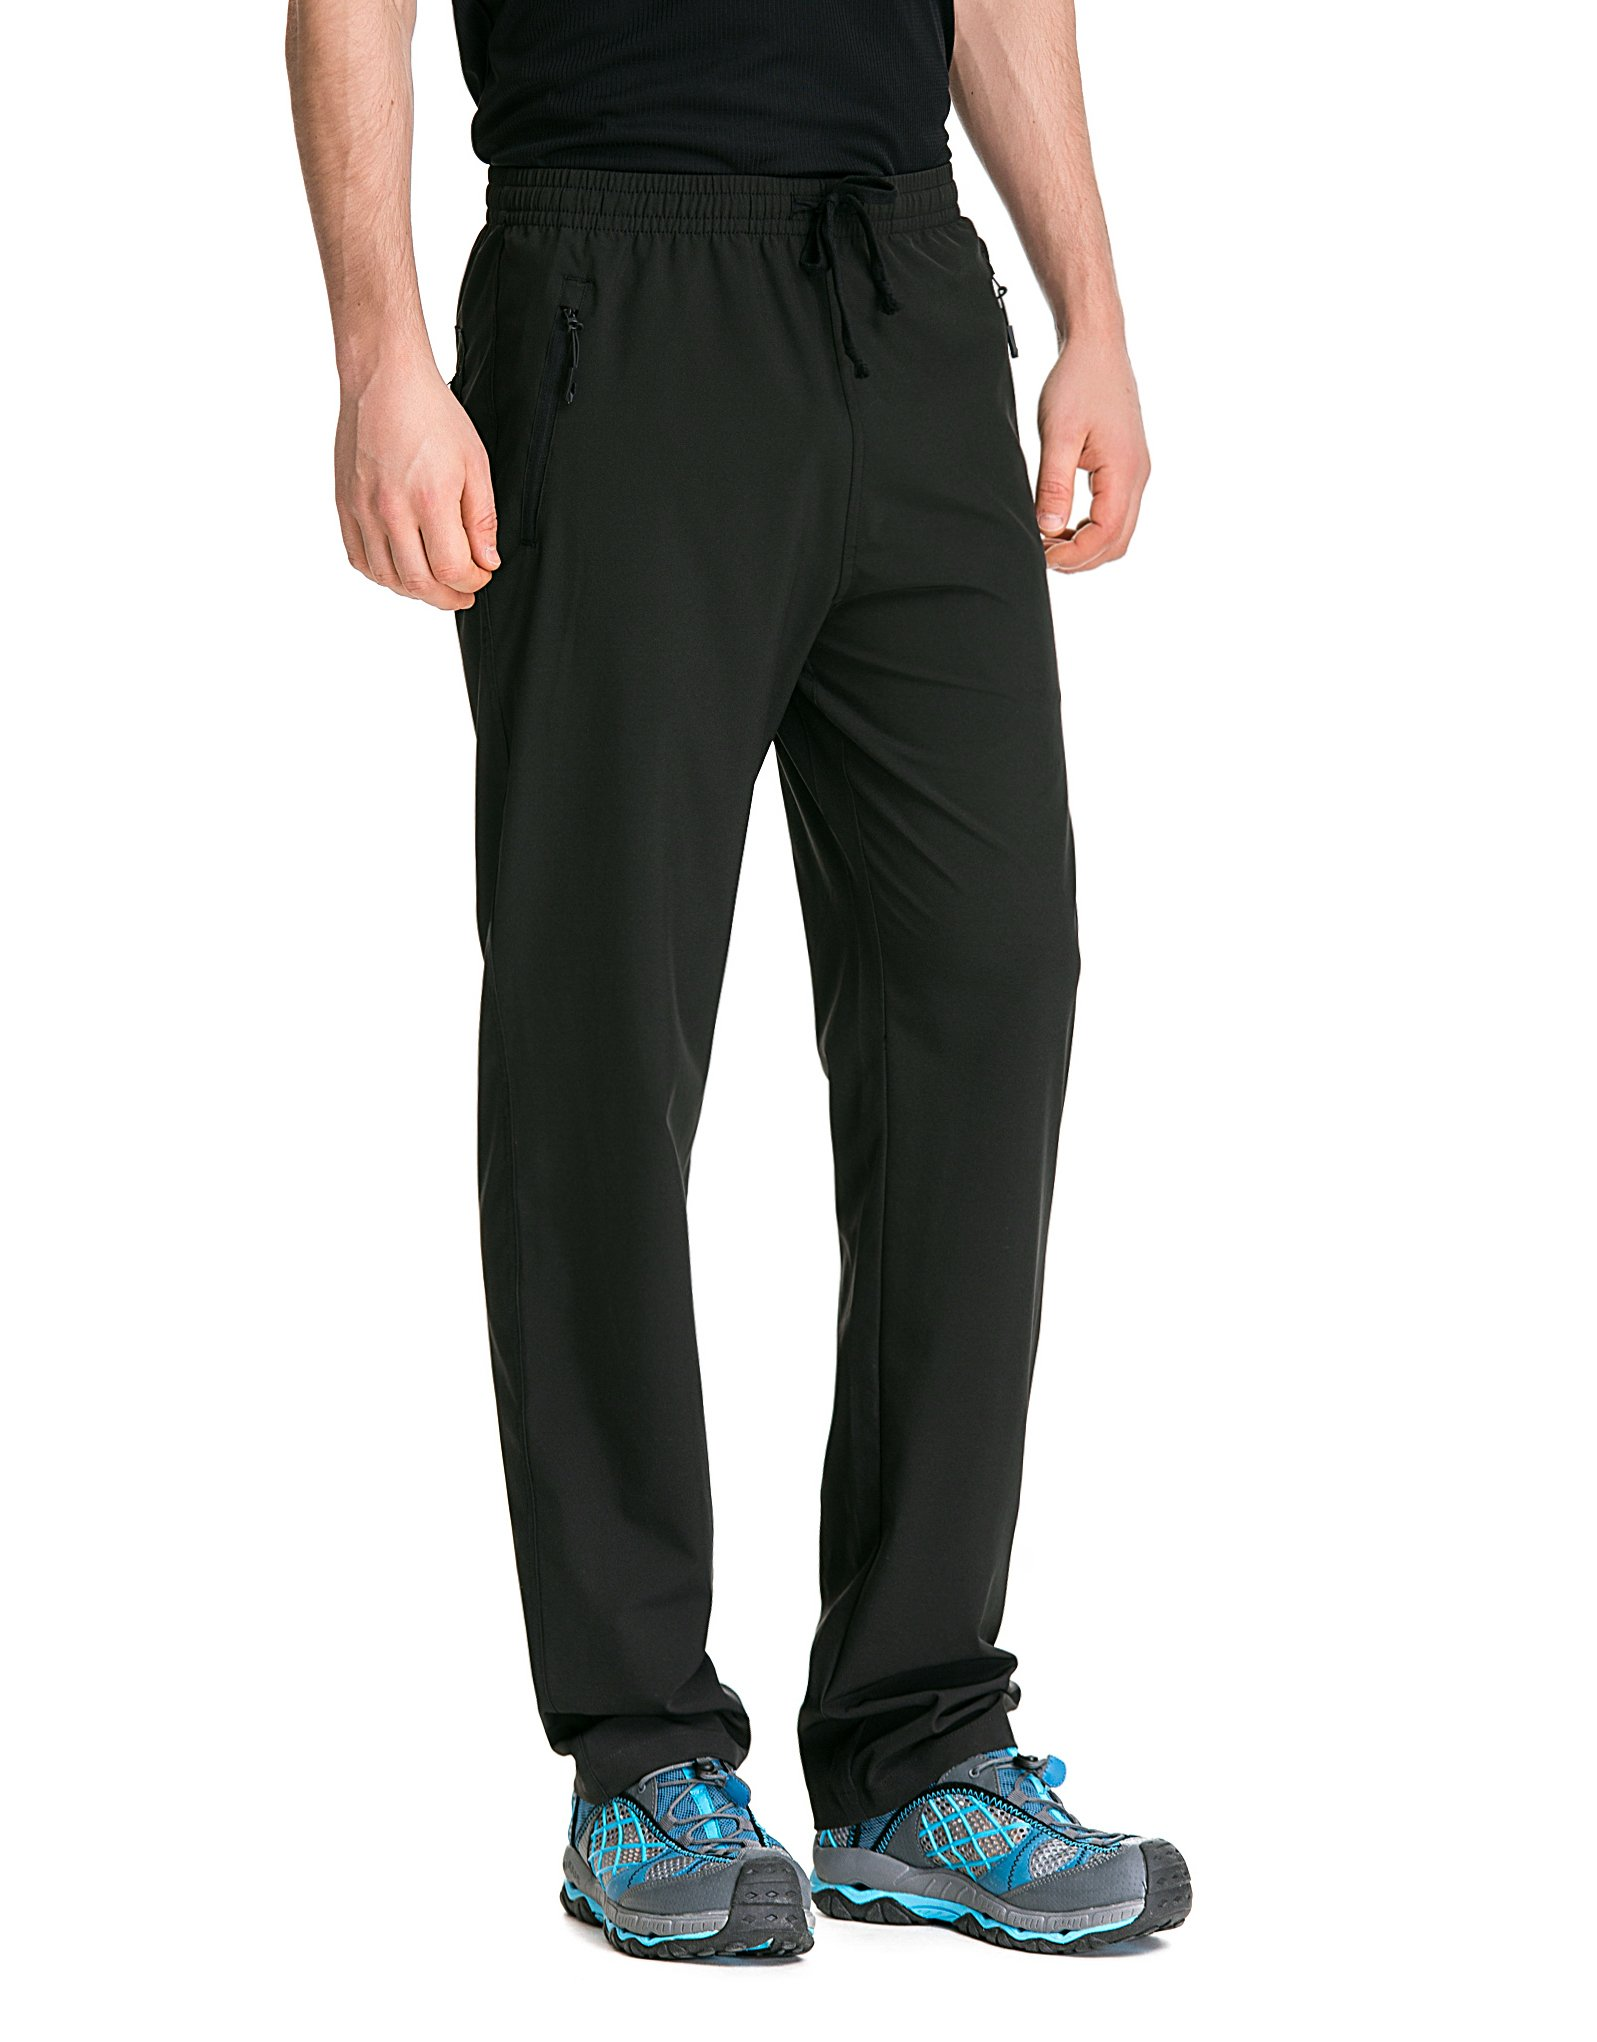 Trailside Supply Co. Men's Light Weight Stretch Elastic-Waist Drawstring Track Running Gym Pants Large Black